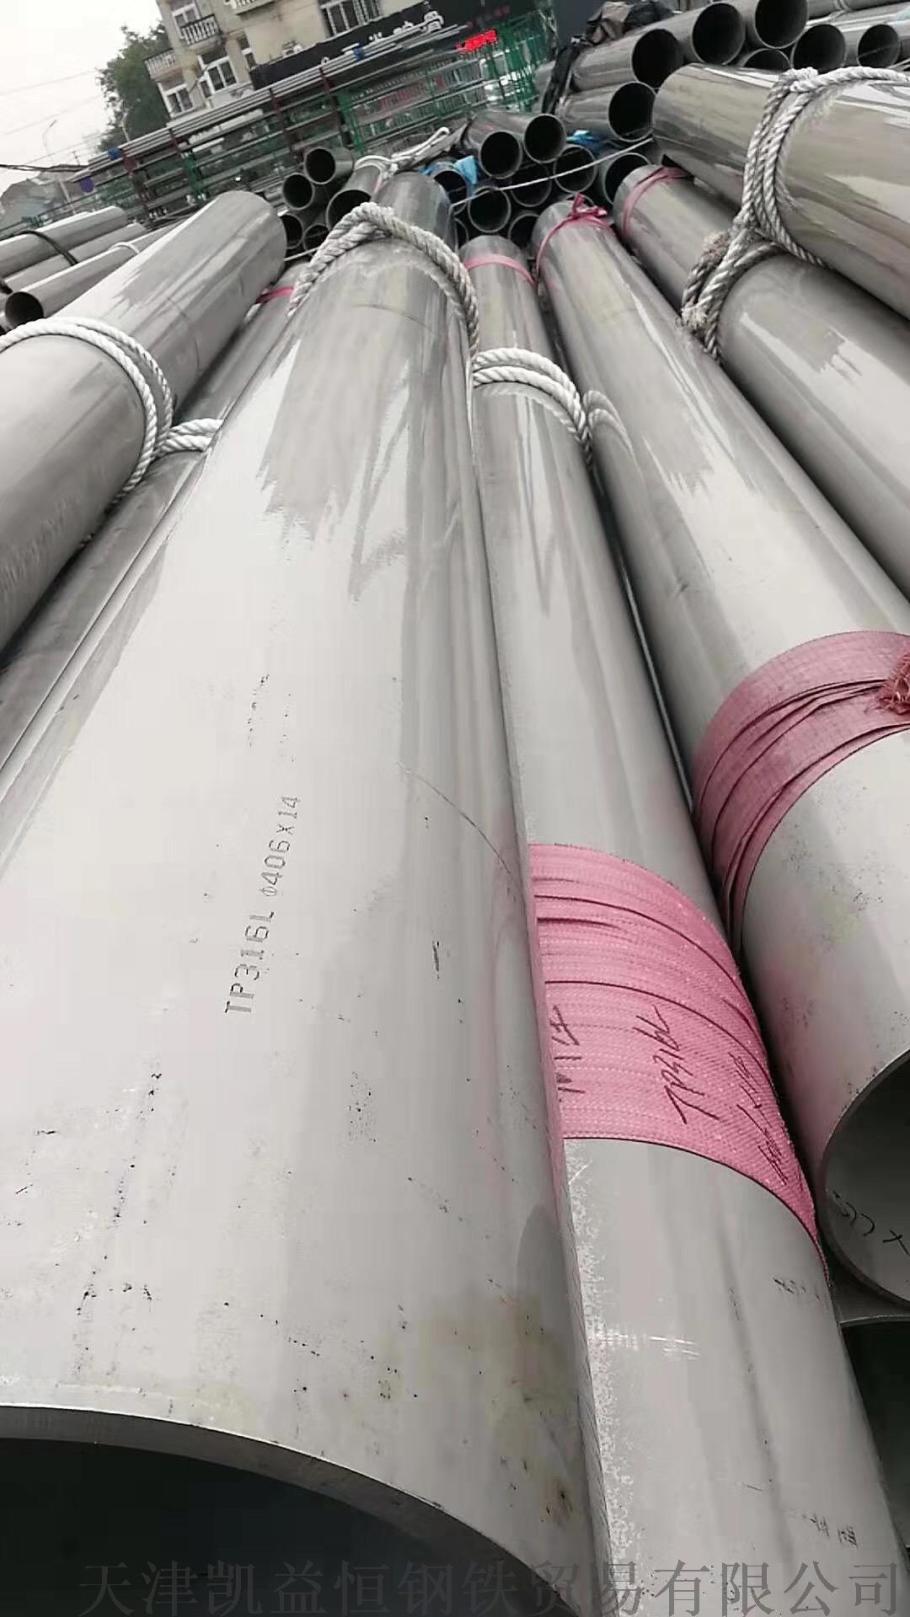 TP316L不鏽鋼流體管 不鏽鋼無縫管廠家825072975